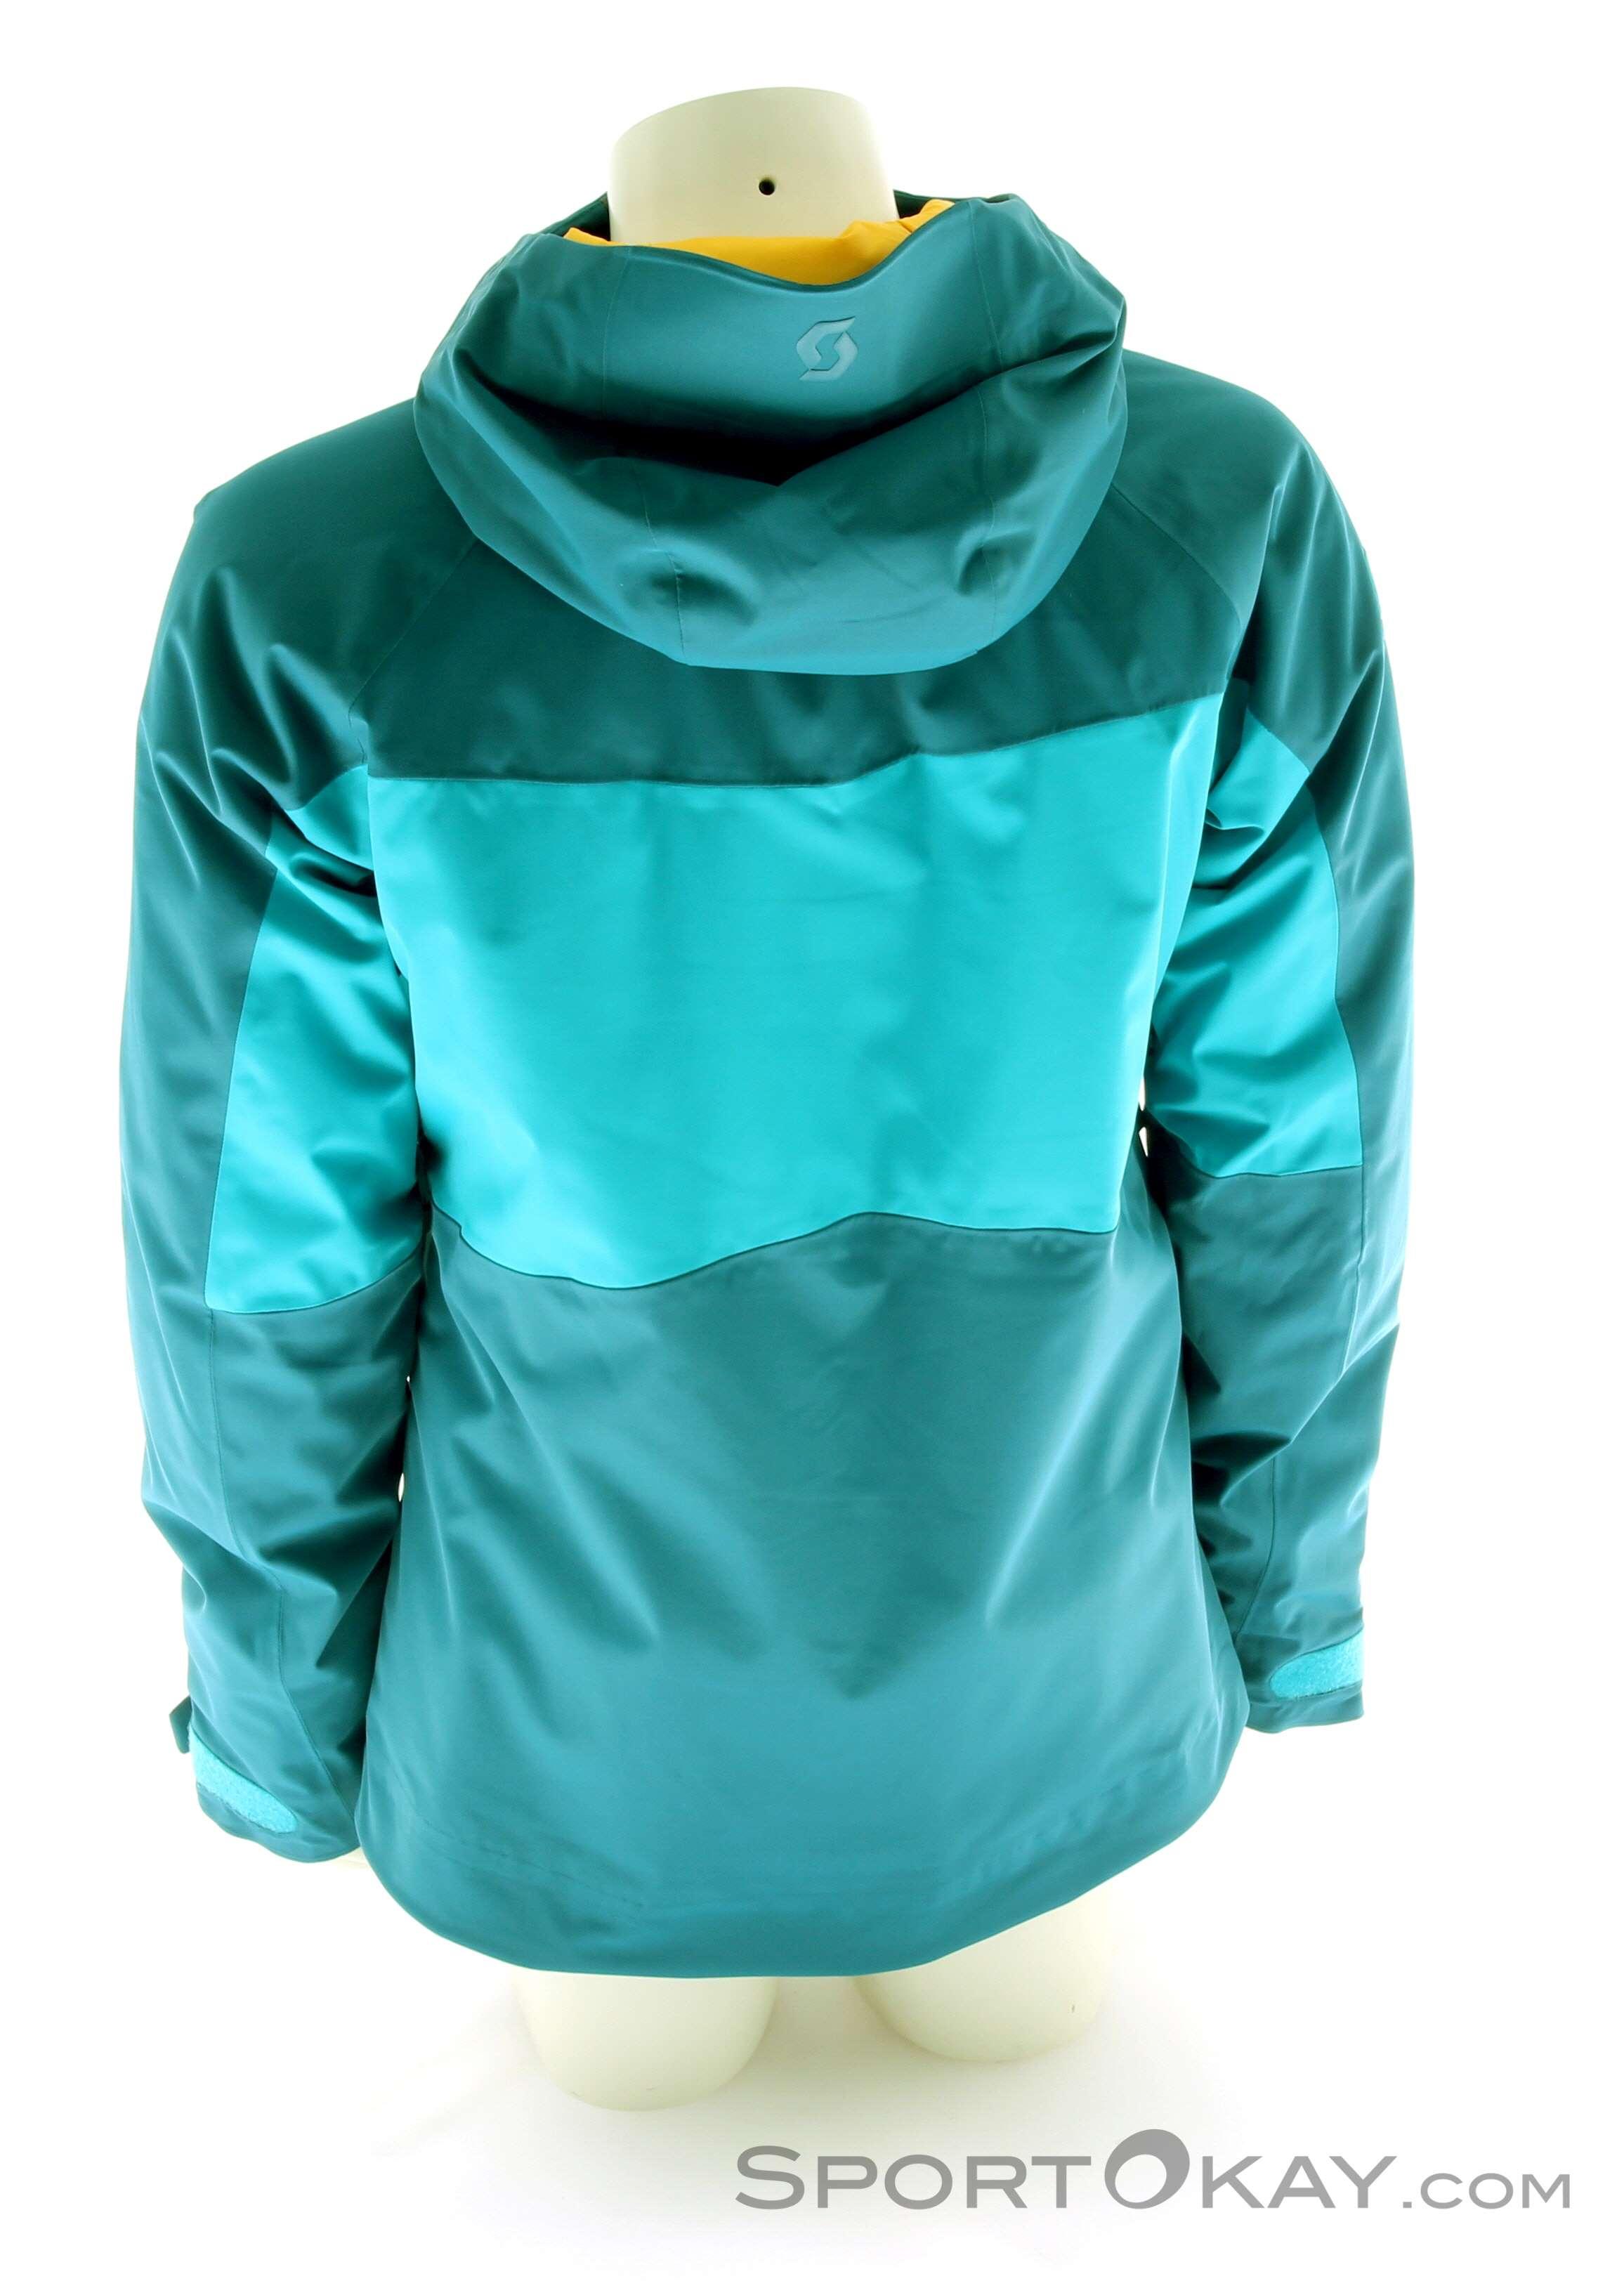 scott ultimate dryo plus mens ski jacket jackets. Black Bedroom Furniture Sets. Home Design Ideas